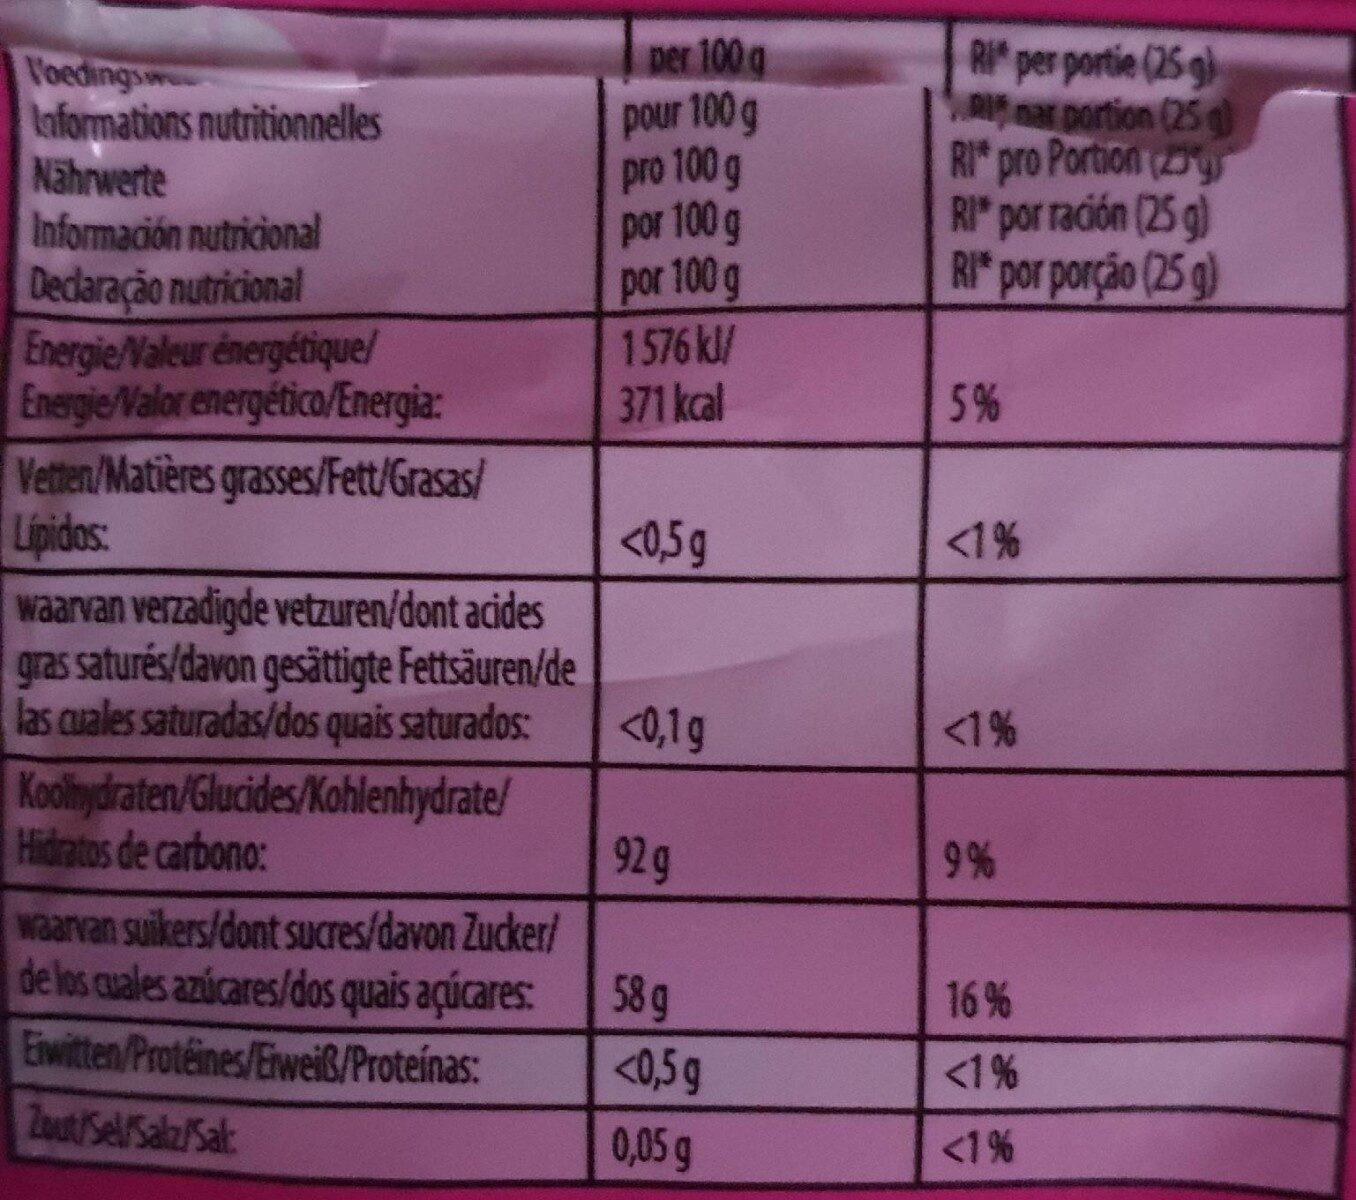 Dragibus Soft - Informació nutricional - fr